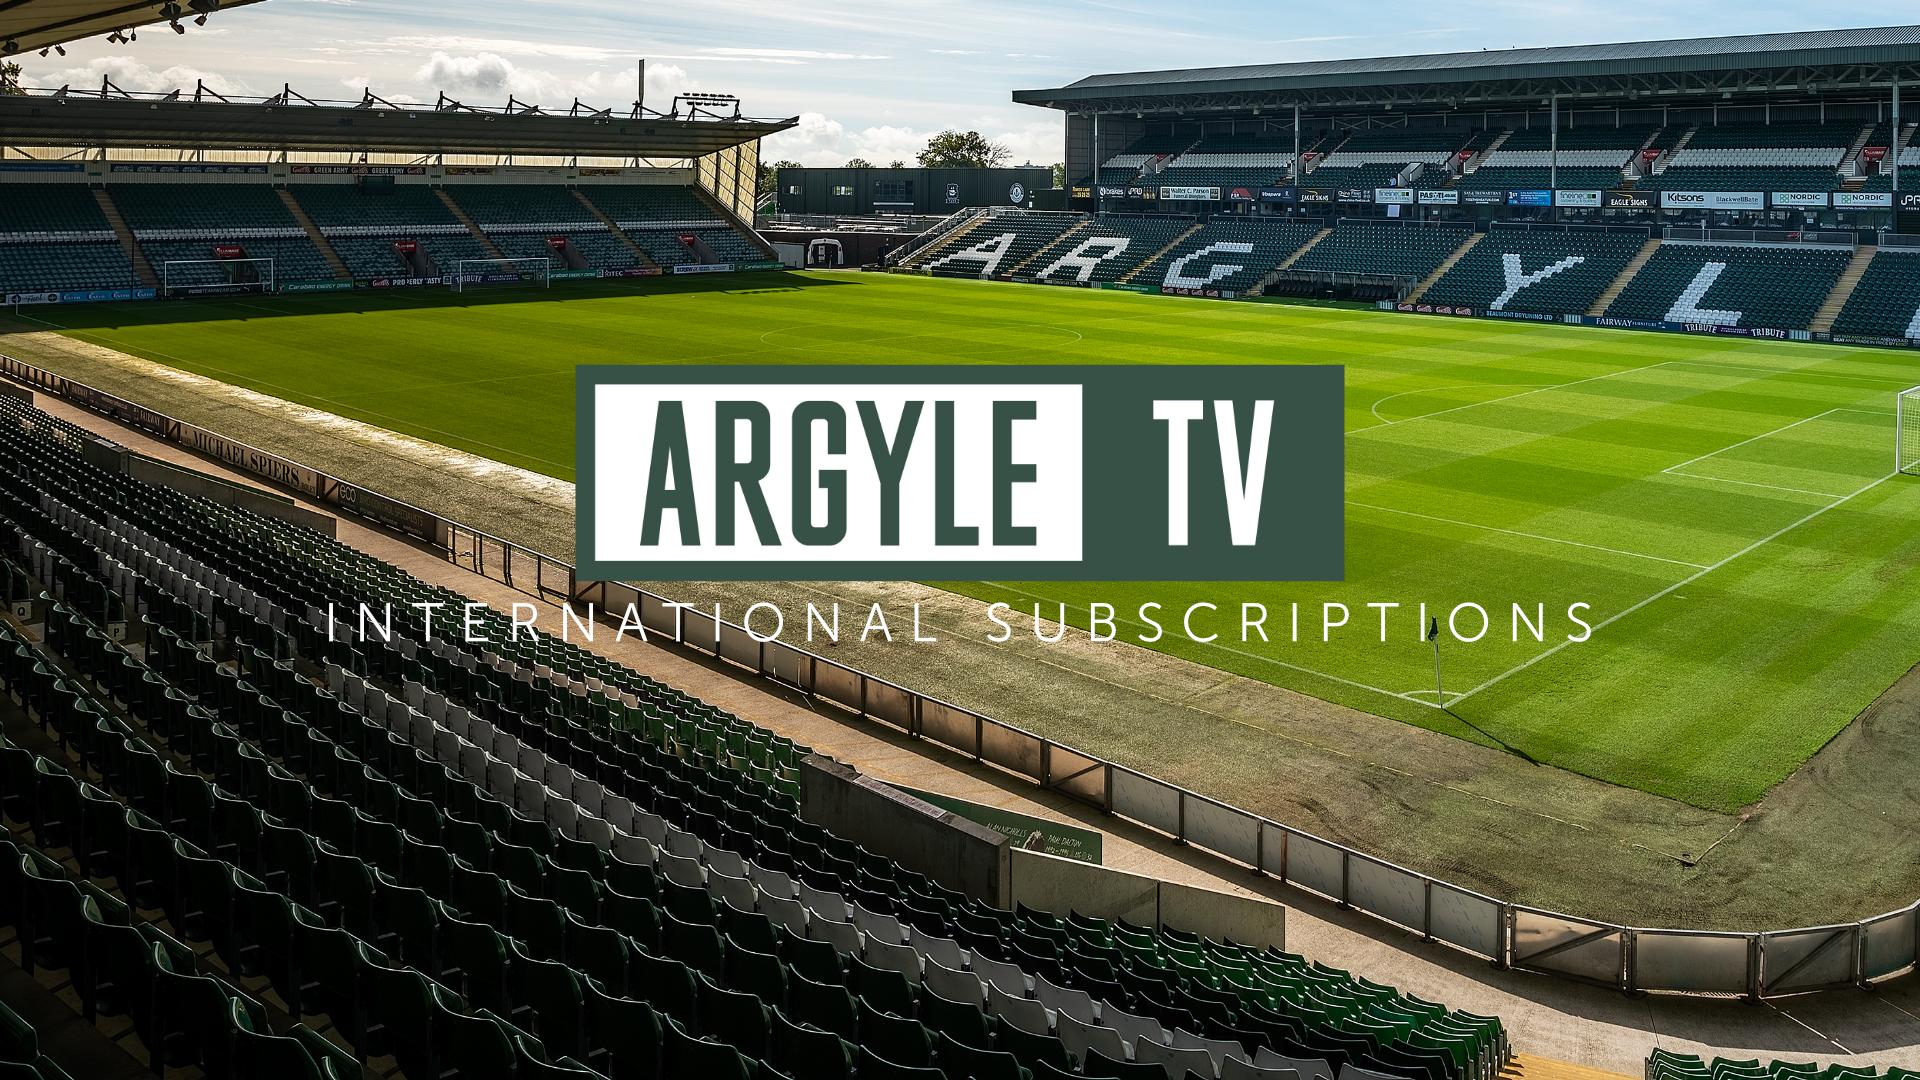 ARGYLE TV INTERNATIONAL